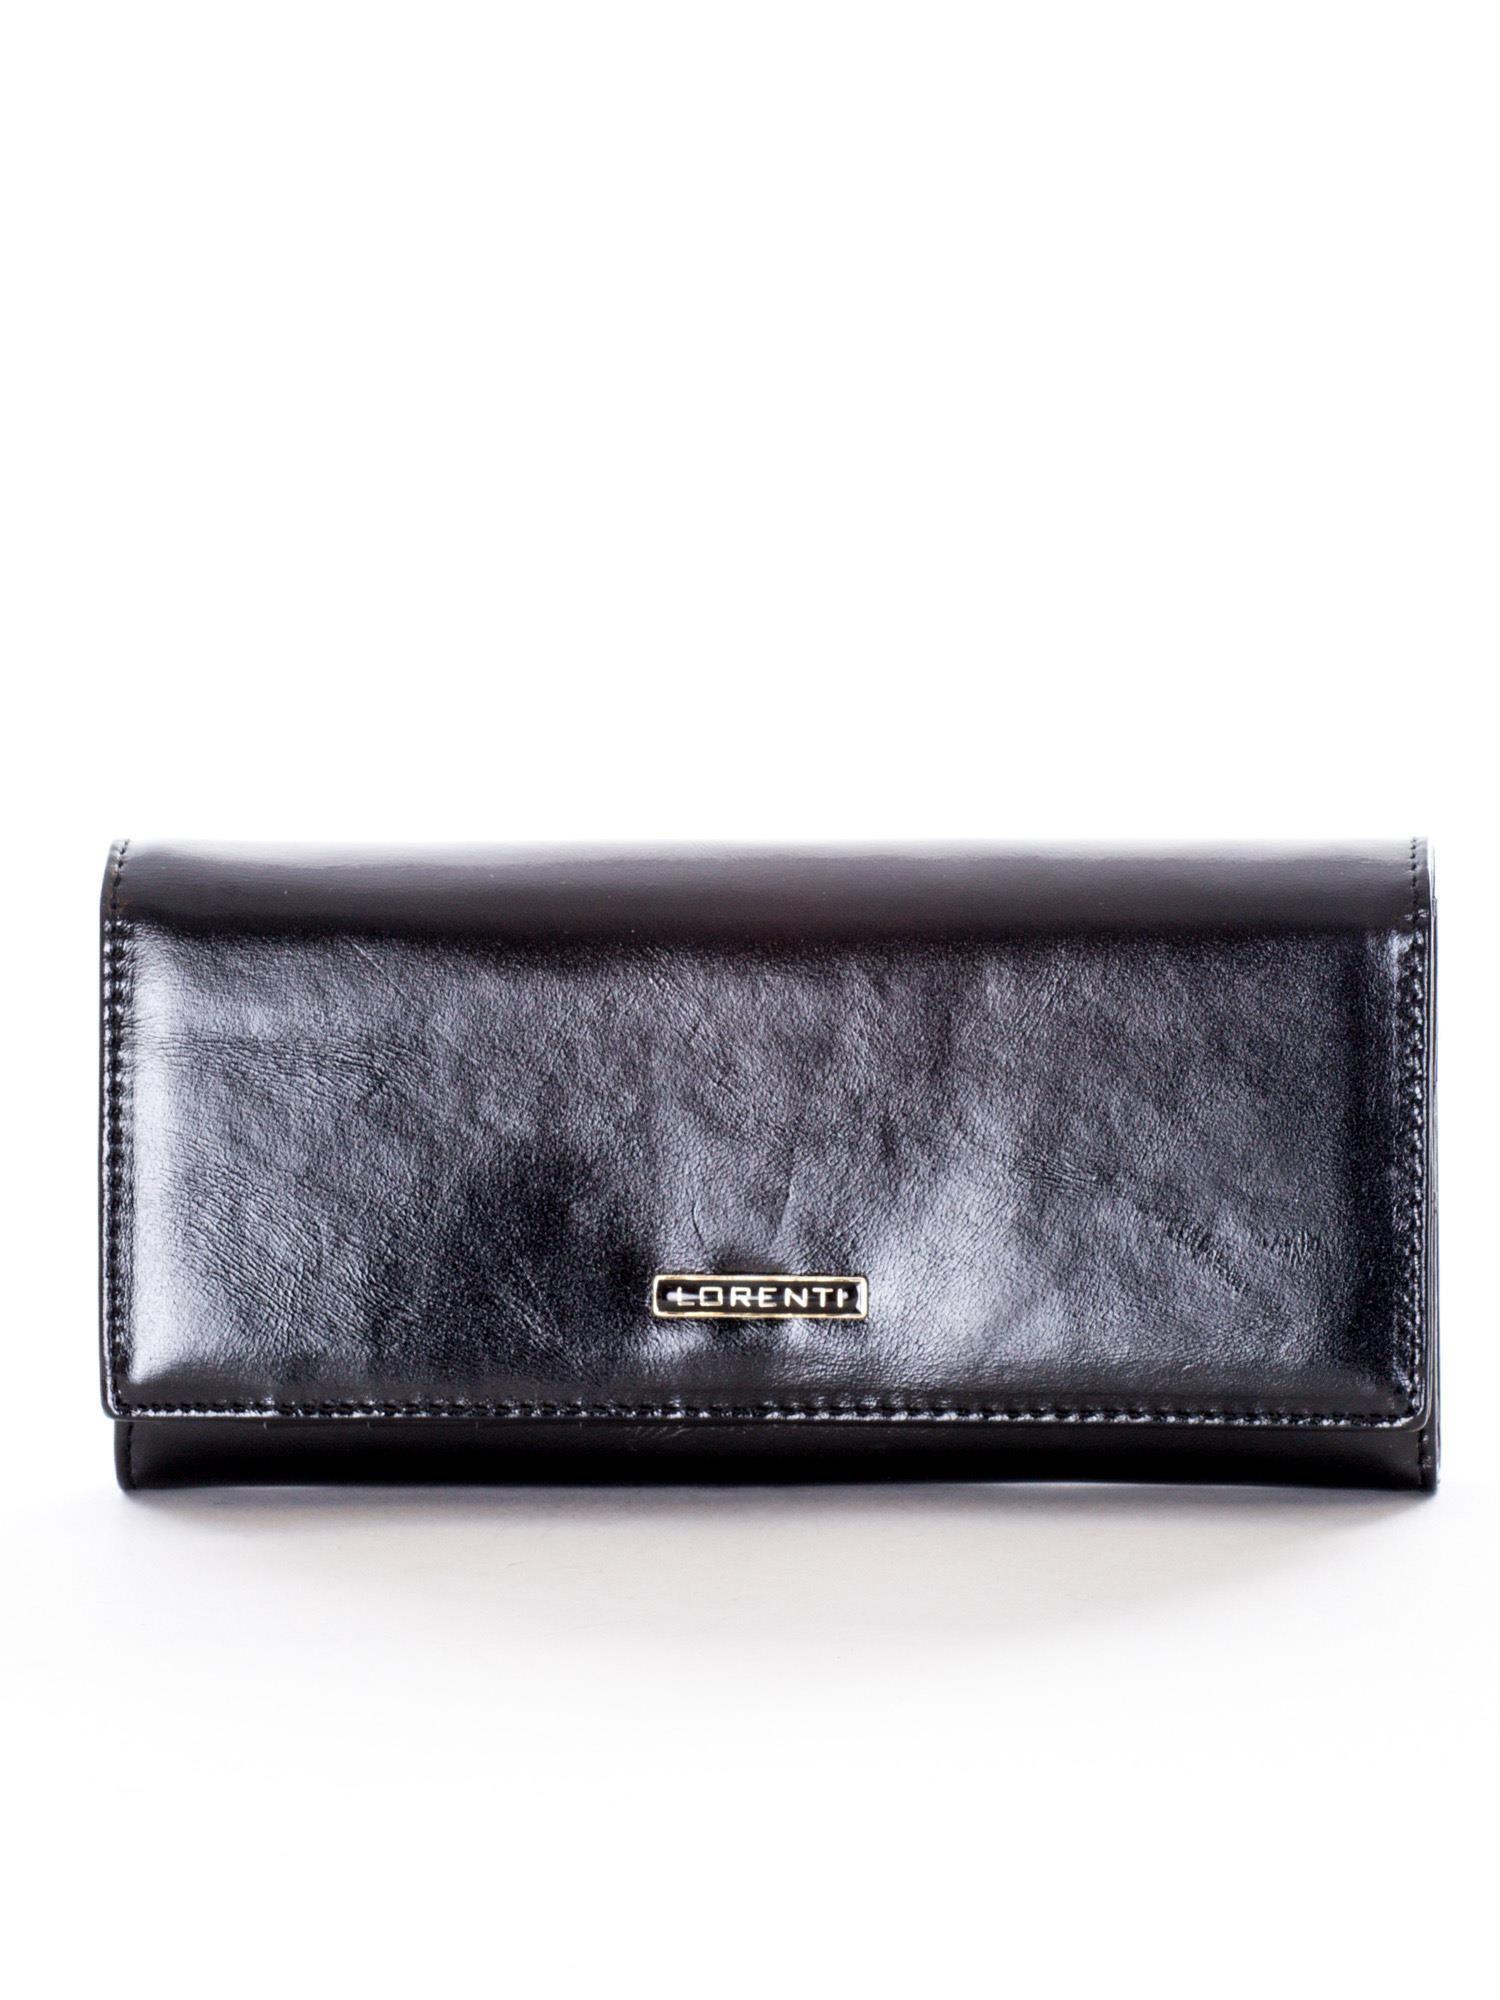 4e83cae7ea5a5 Czarny podłużny portfel skórzany - Akcesoria portfele - sklep eButik.pl